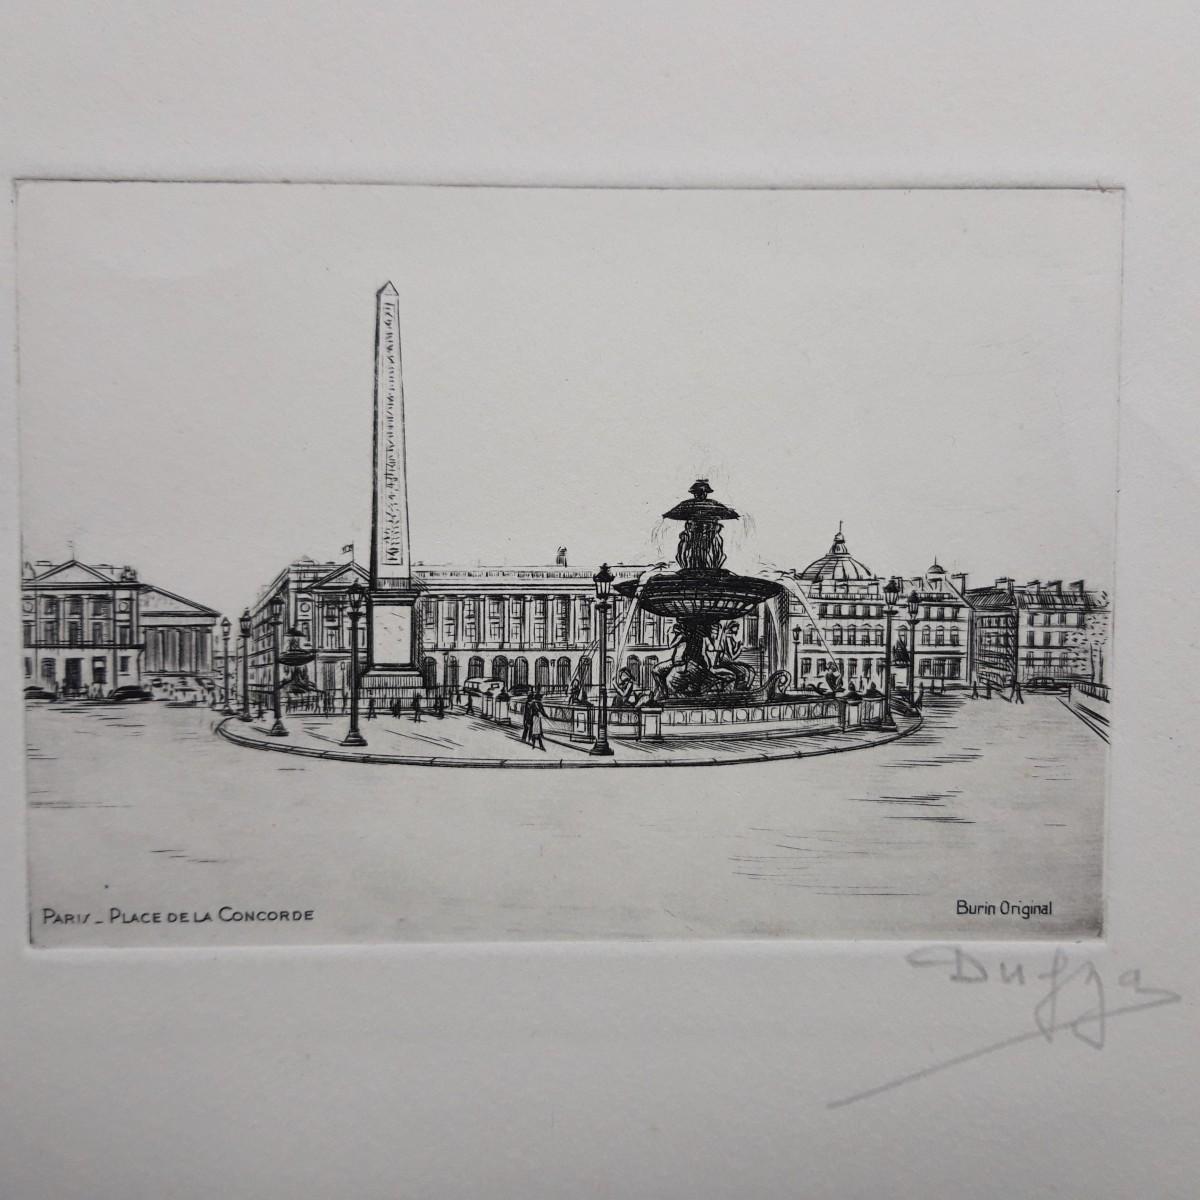 Albert Dumouchel - Radierung auf Bütten. 'Paris- Place de la Concorde' kopen? Bied vanaf 75!